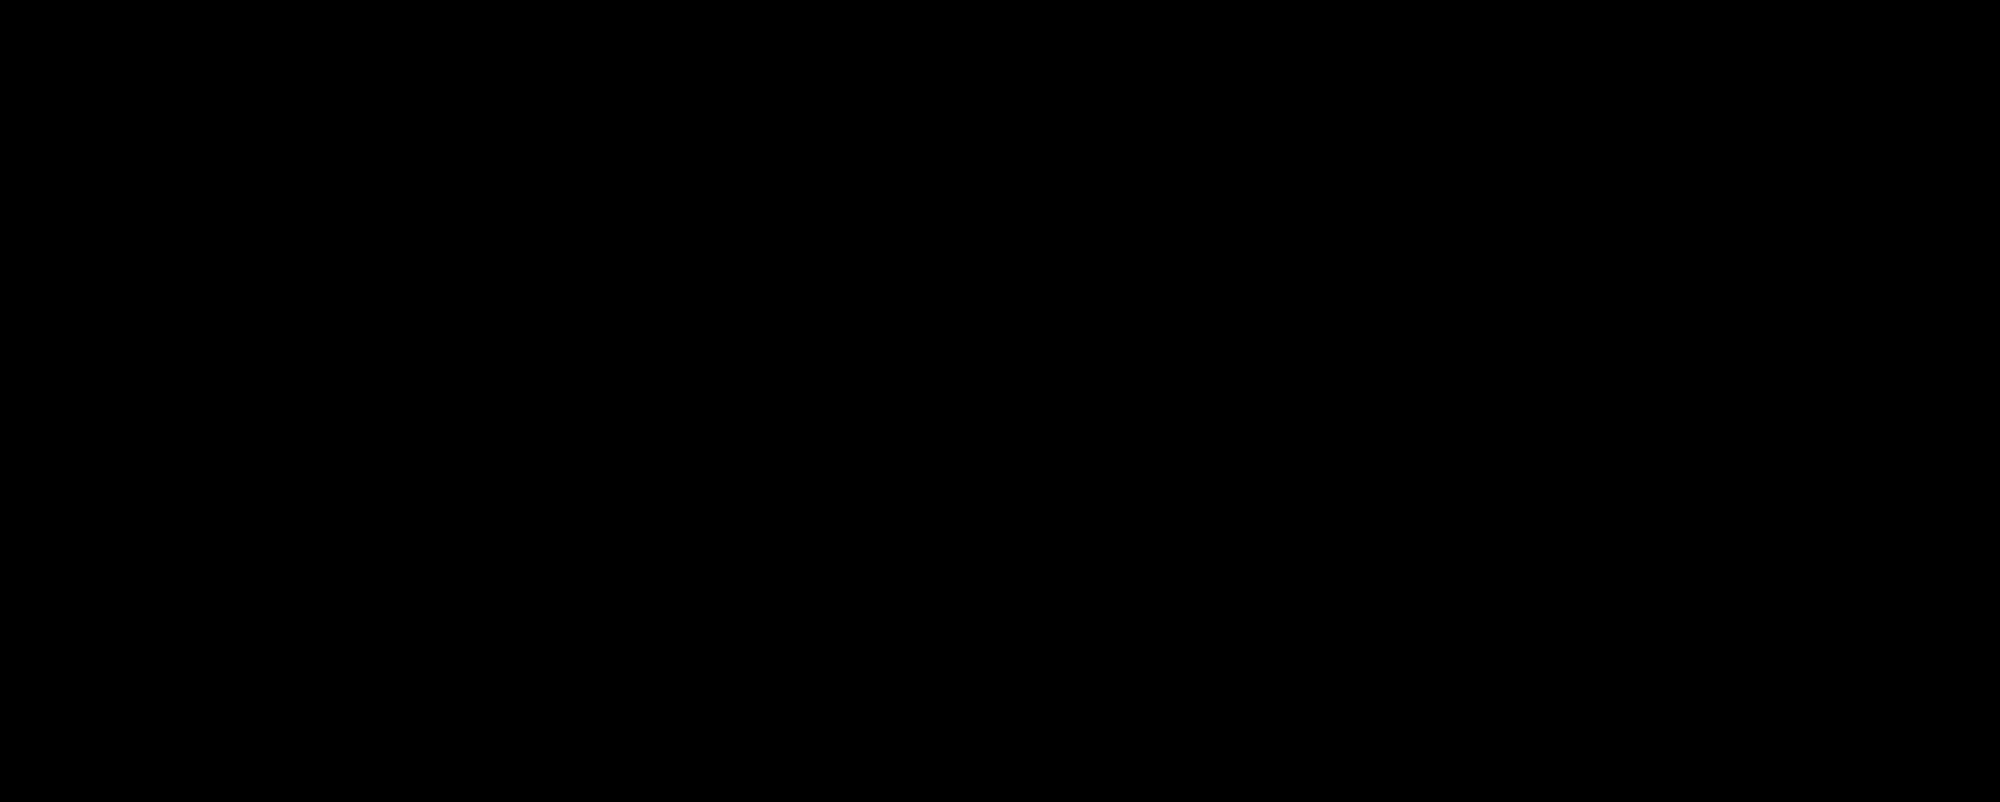 NetSim logo